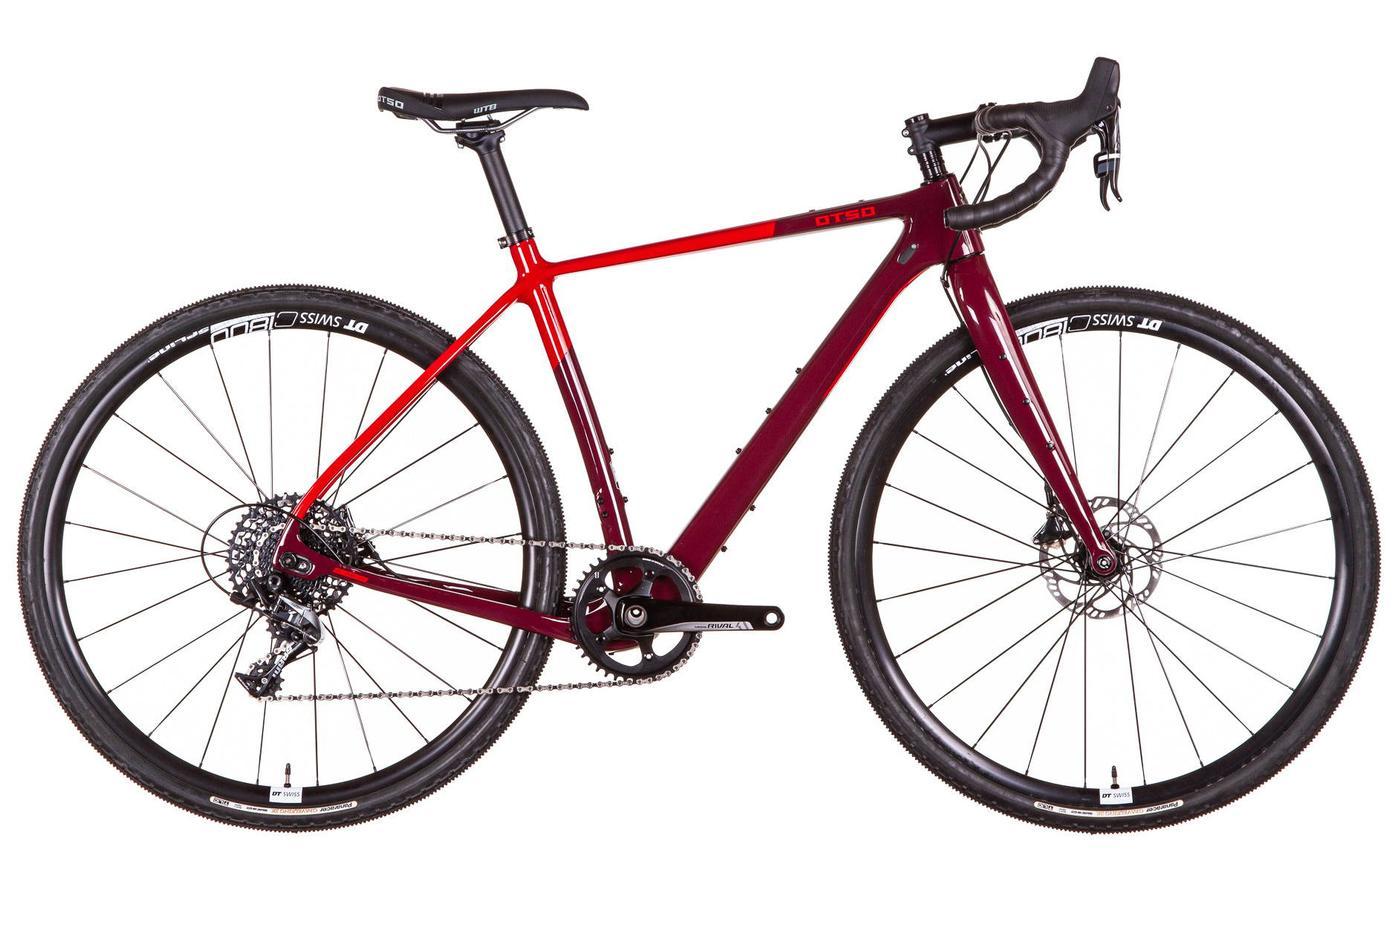 Otso Cycles Has Waheela C Completes In Stock